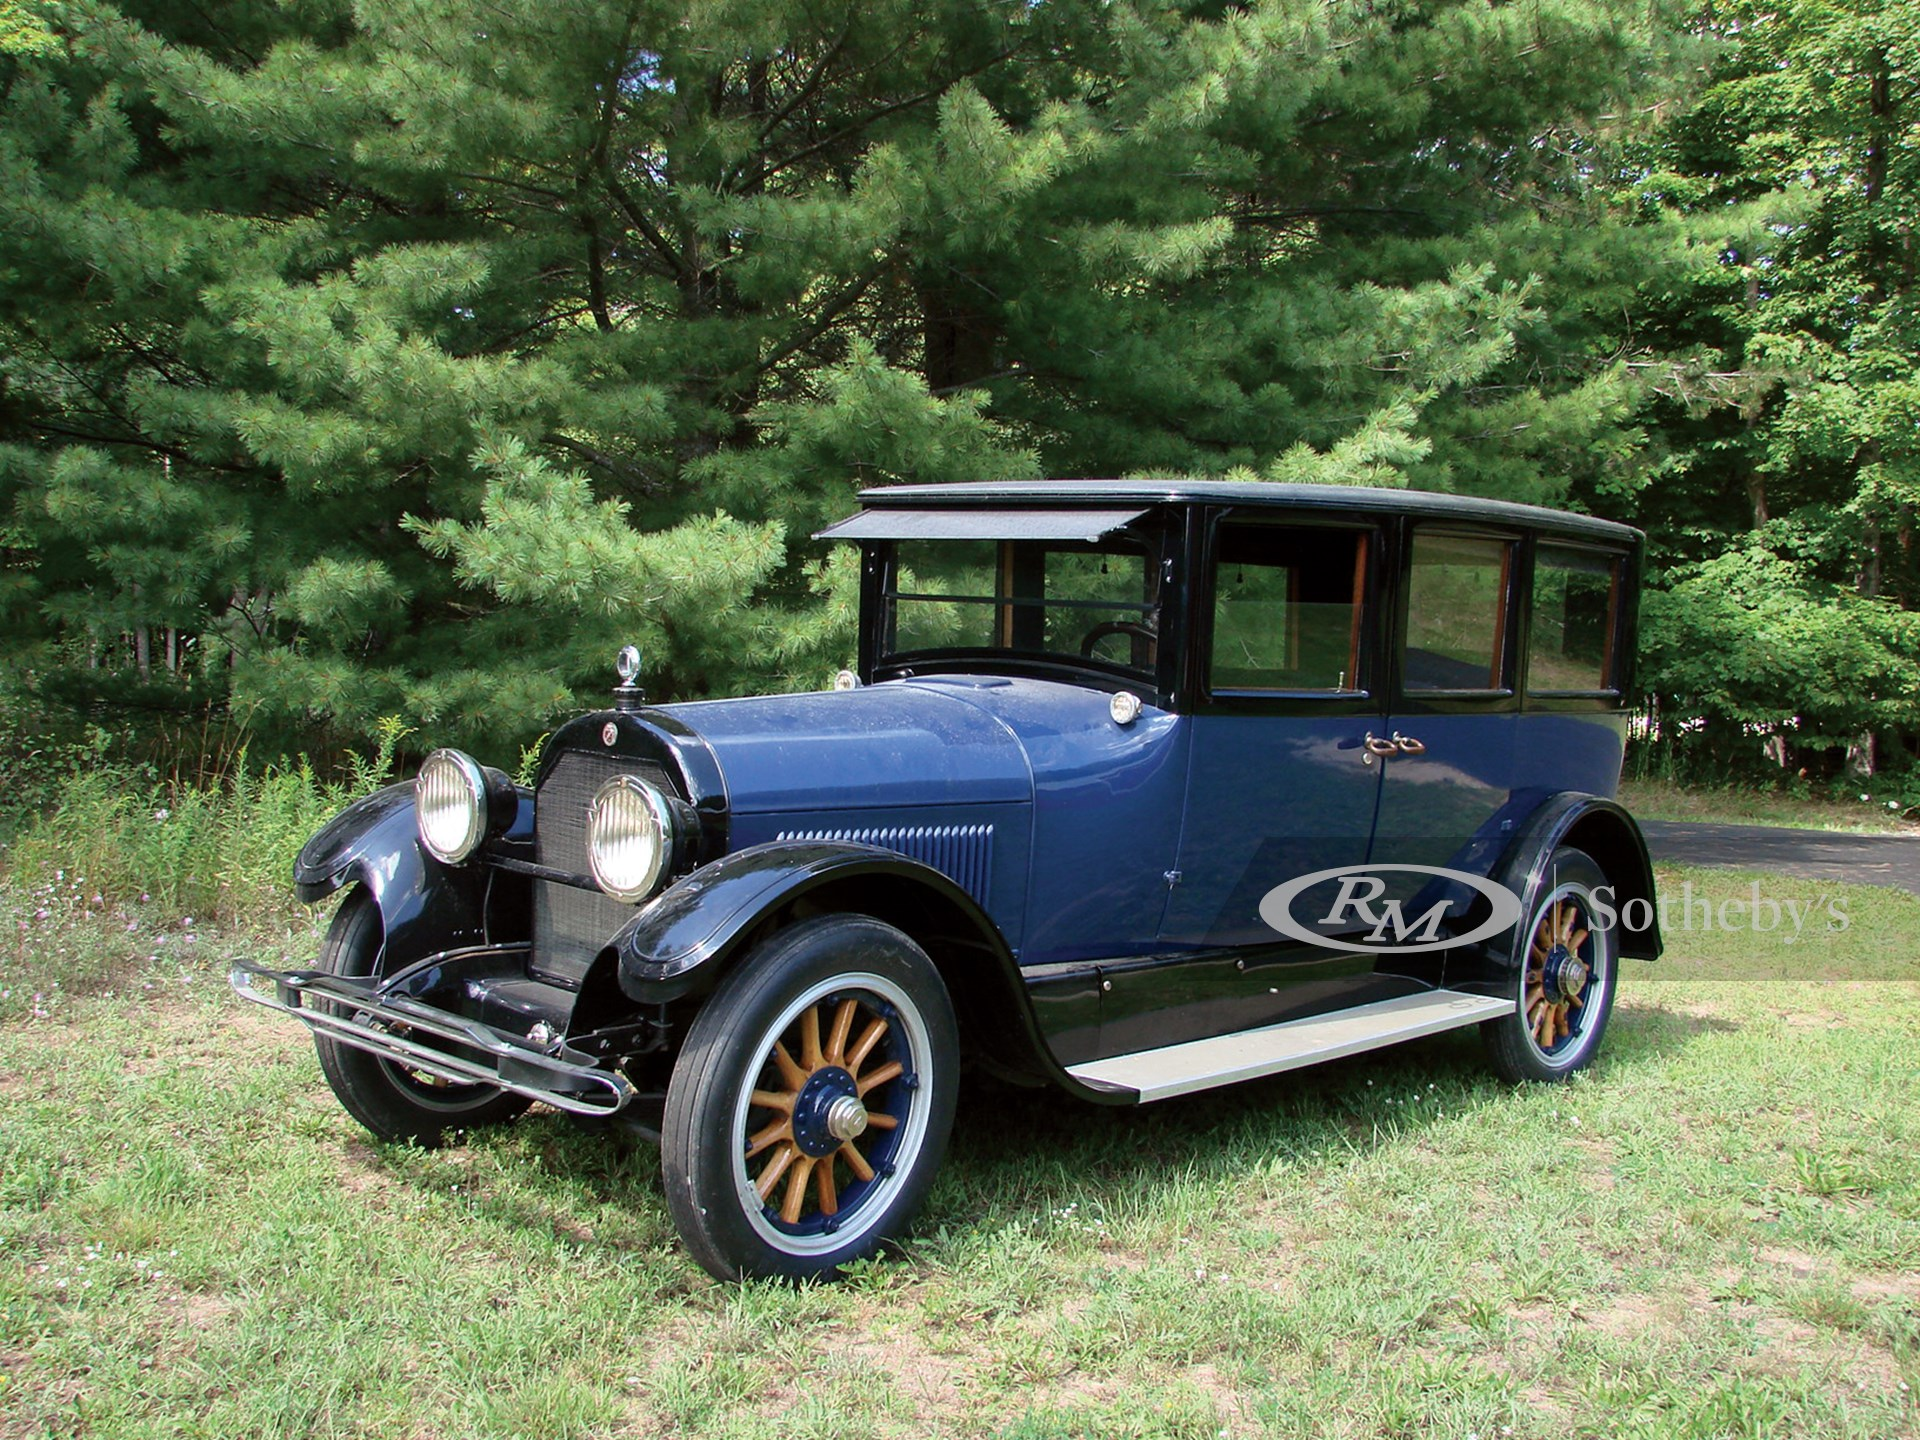 1922 Cadillac Model 61 Suburban Seven Passenger Sedan Vintage Motor Cars Of Hershey 2009 Rm Auctions